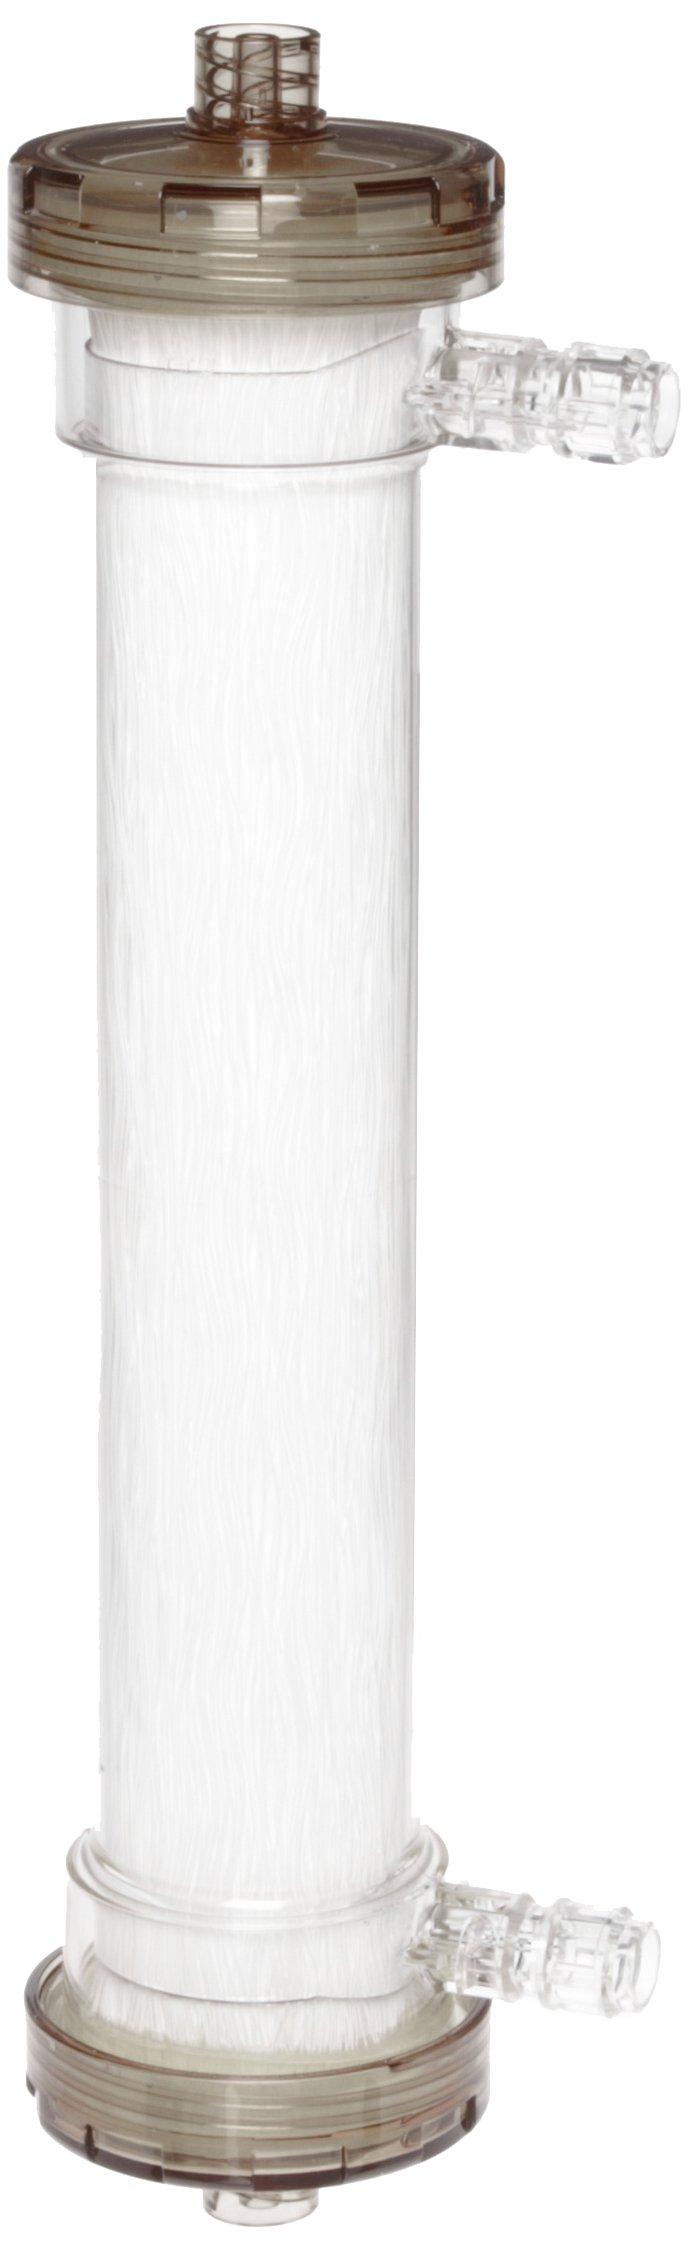 Elga LC169 Ultra Filtration Cartridge, For Purelab Classic